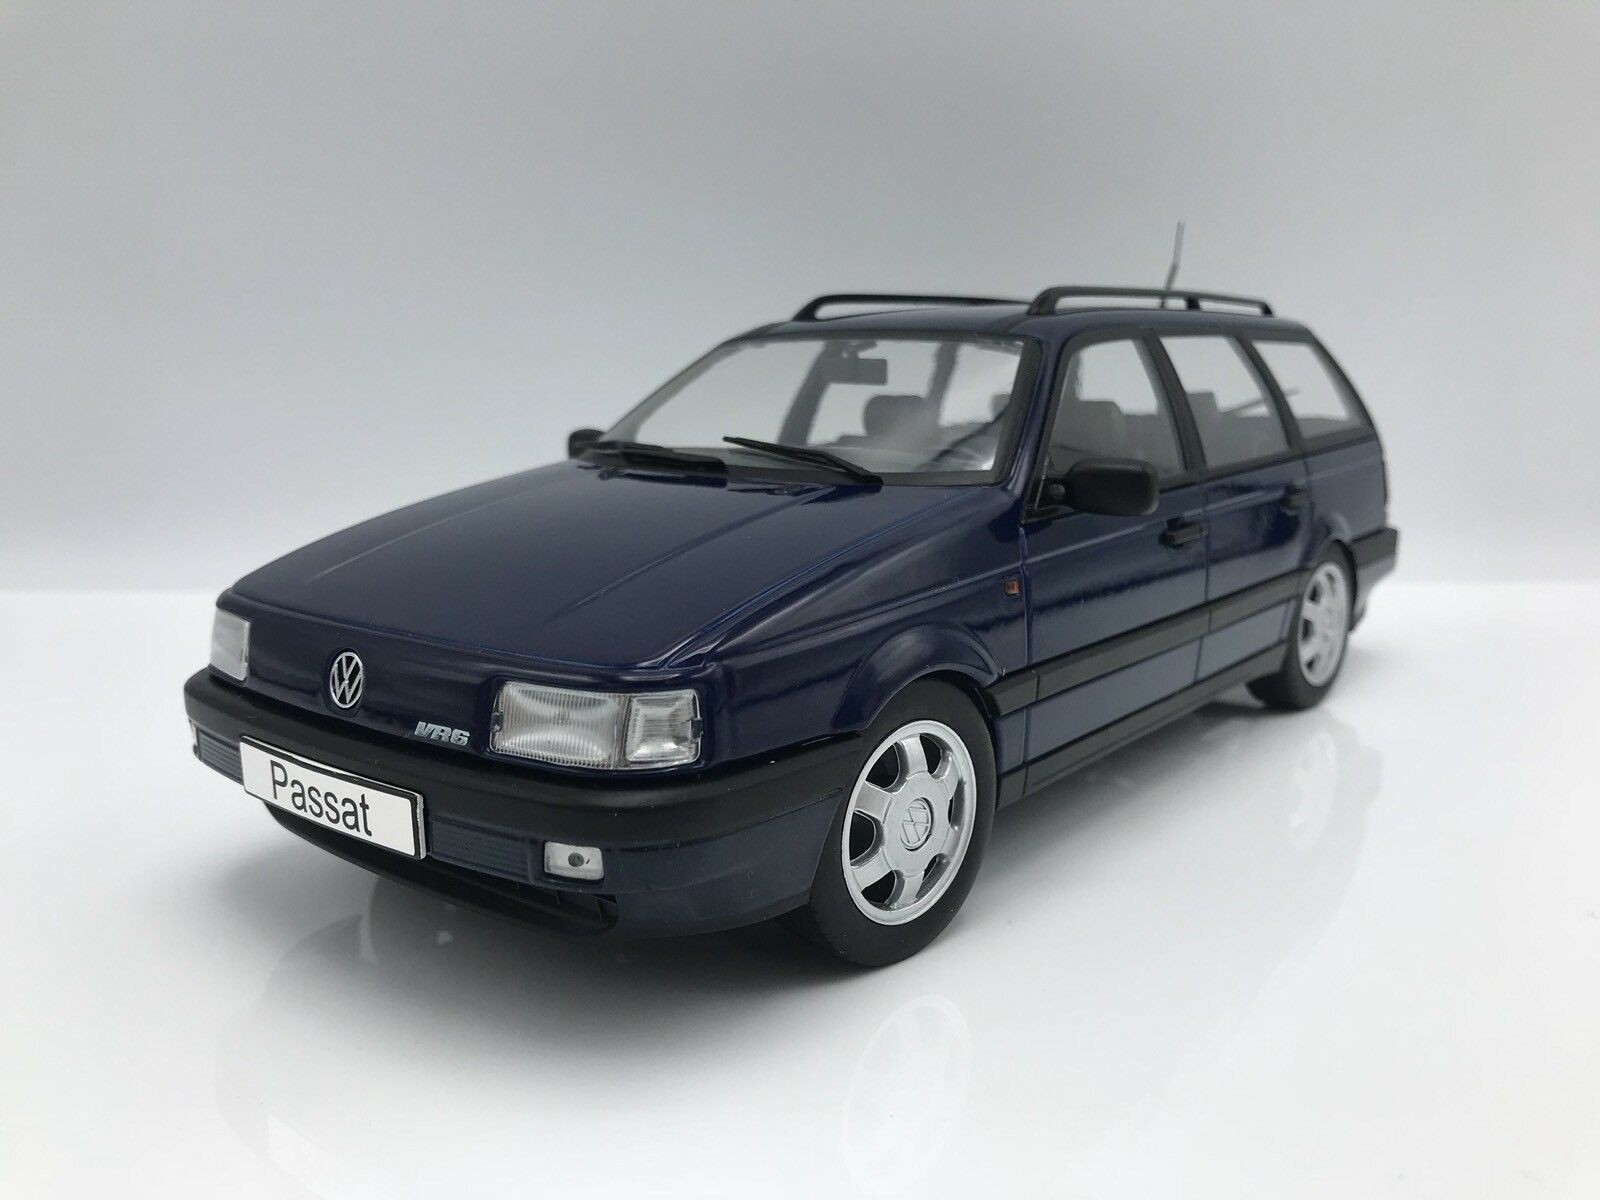 VW VW VW Volkswagen passat b3 vr6 VARIANT 1988-metallic-bleu foncé - 1 18 KK-Scale 304bbf